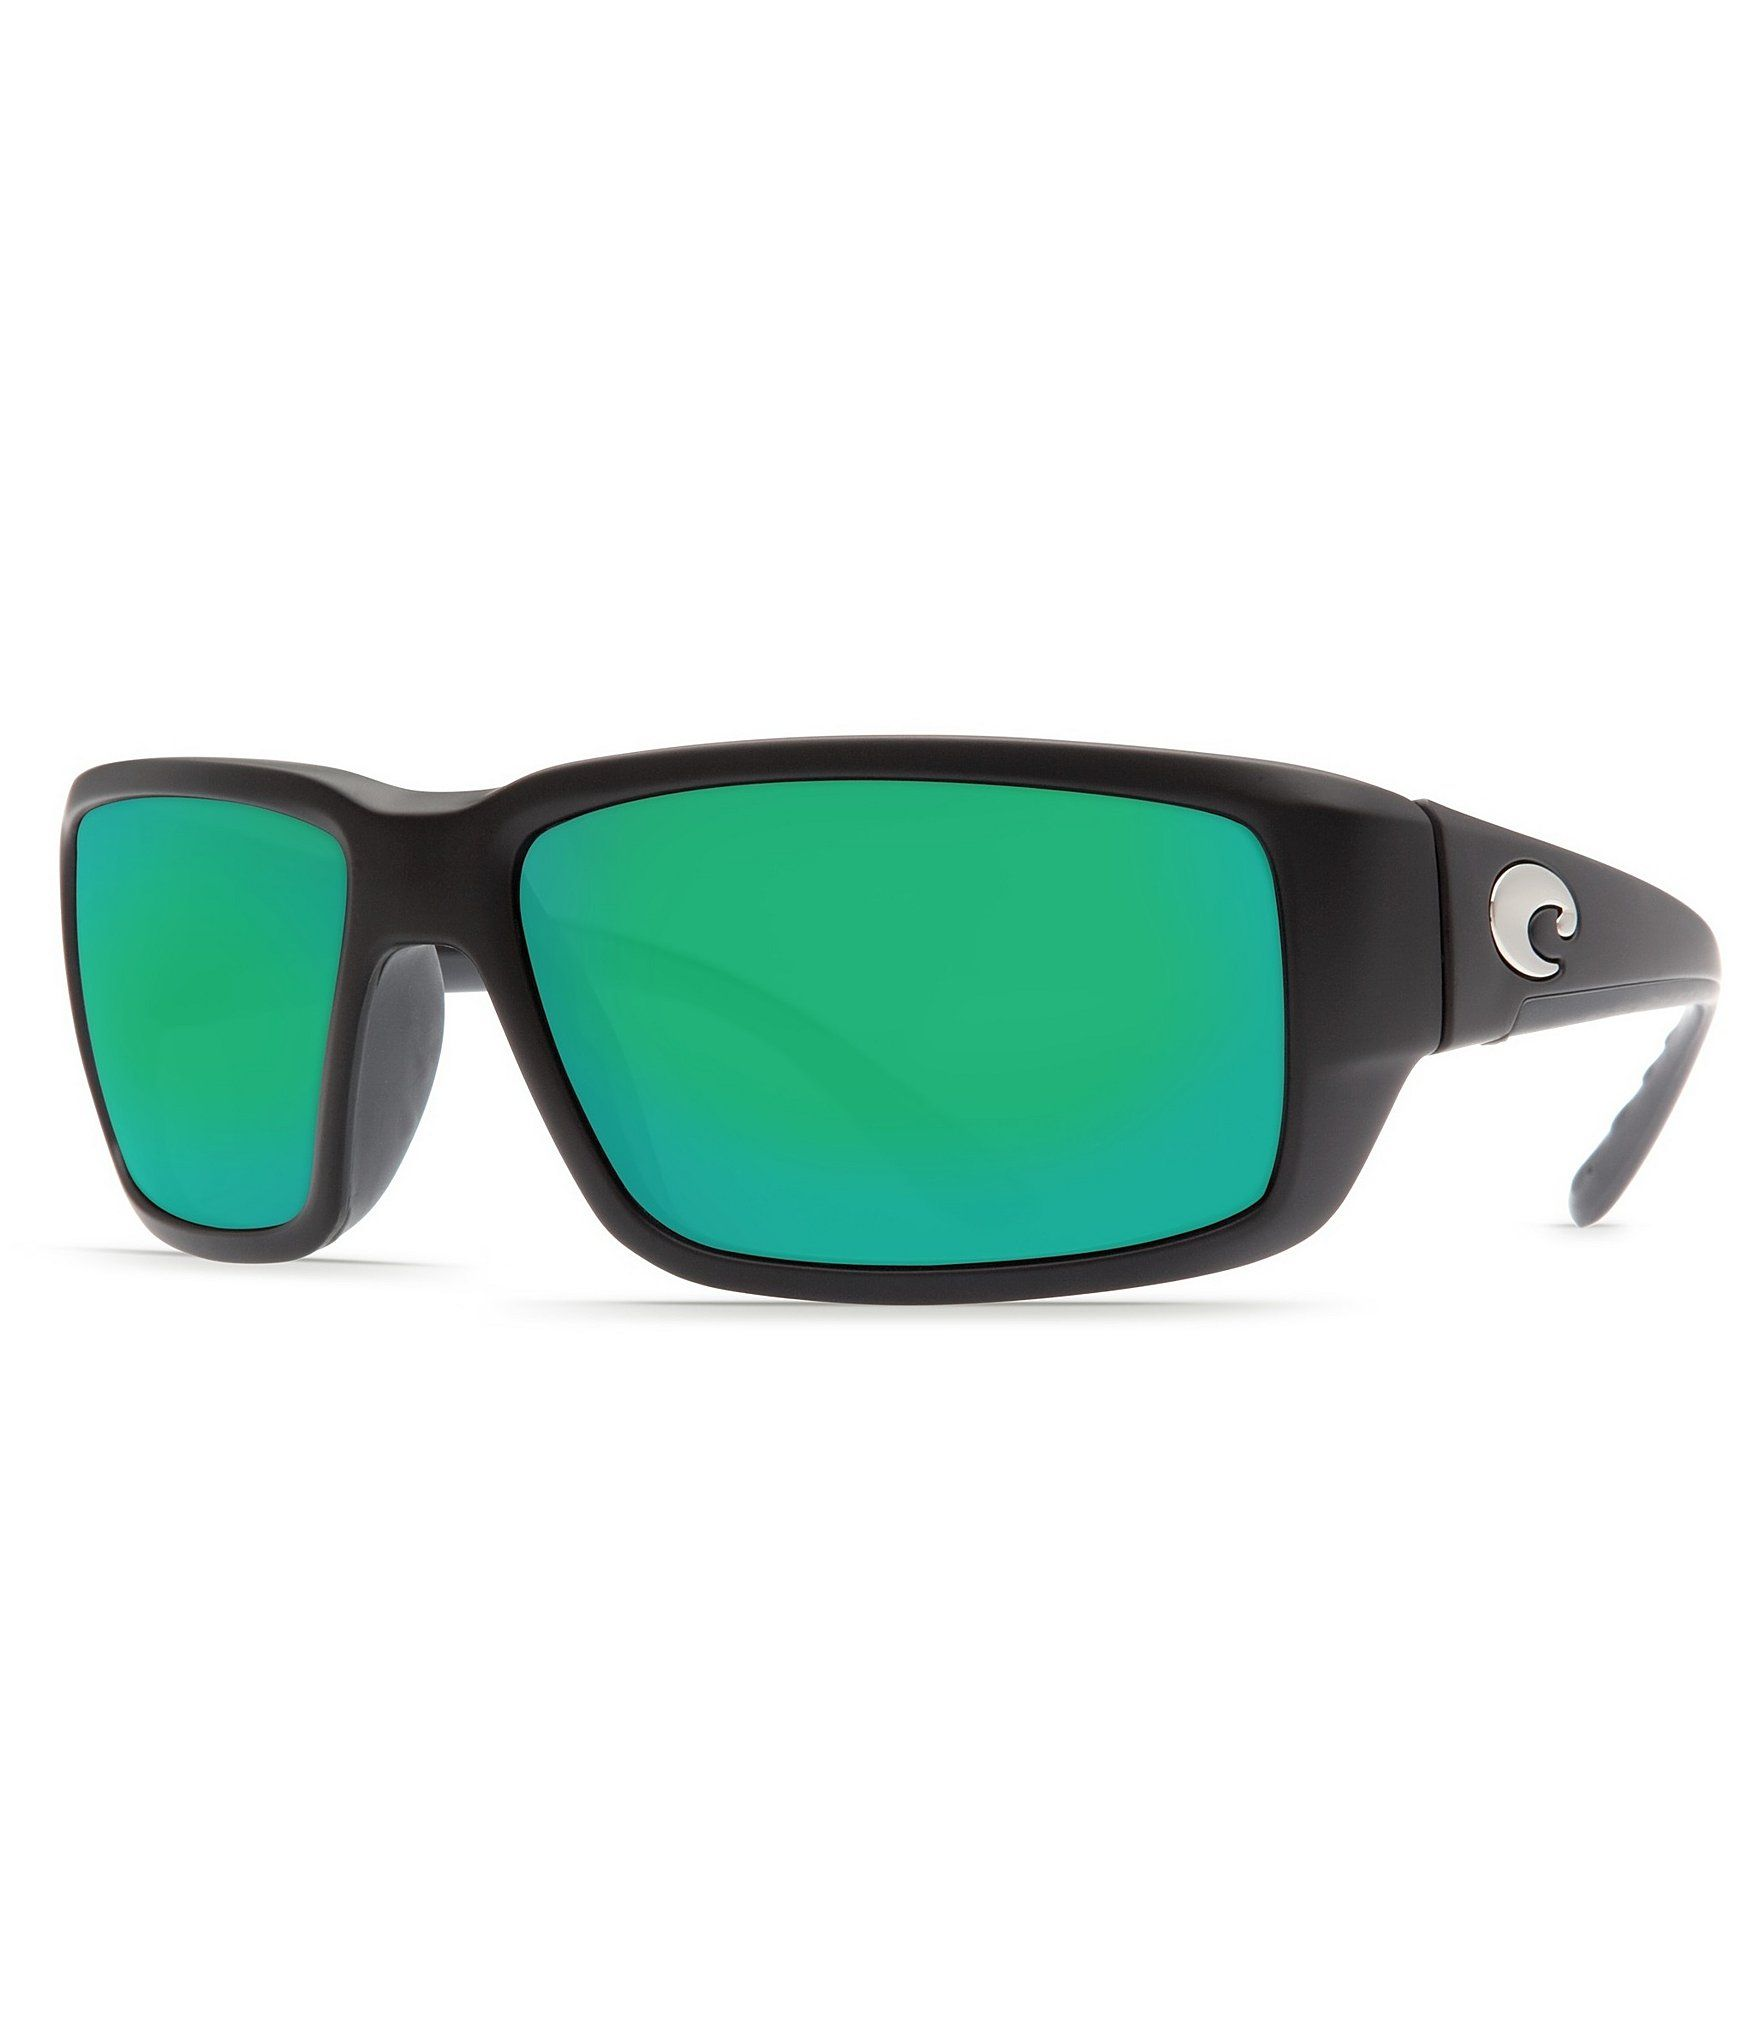 Costa Fantail Polarized Wrap Sunglasses Dillard's in